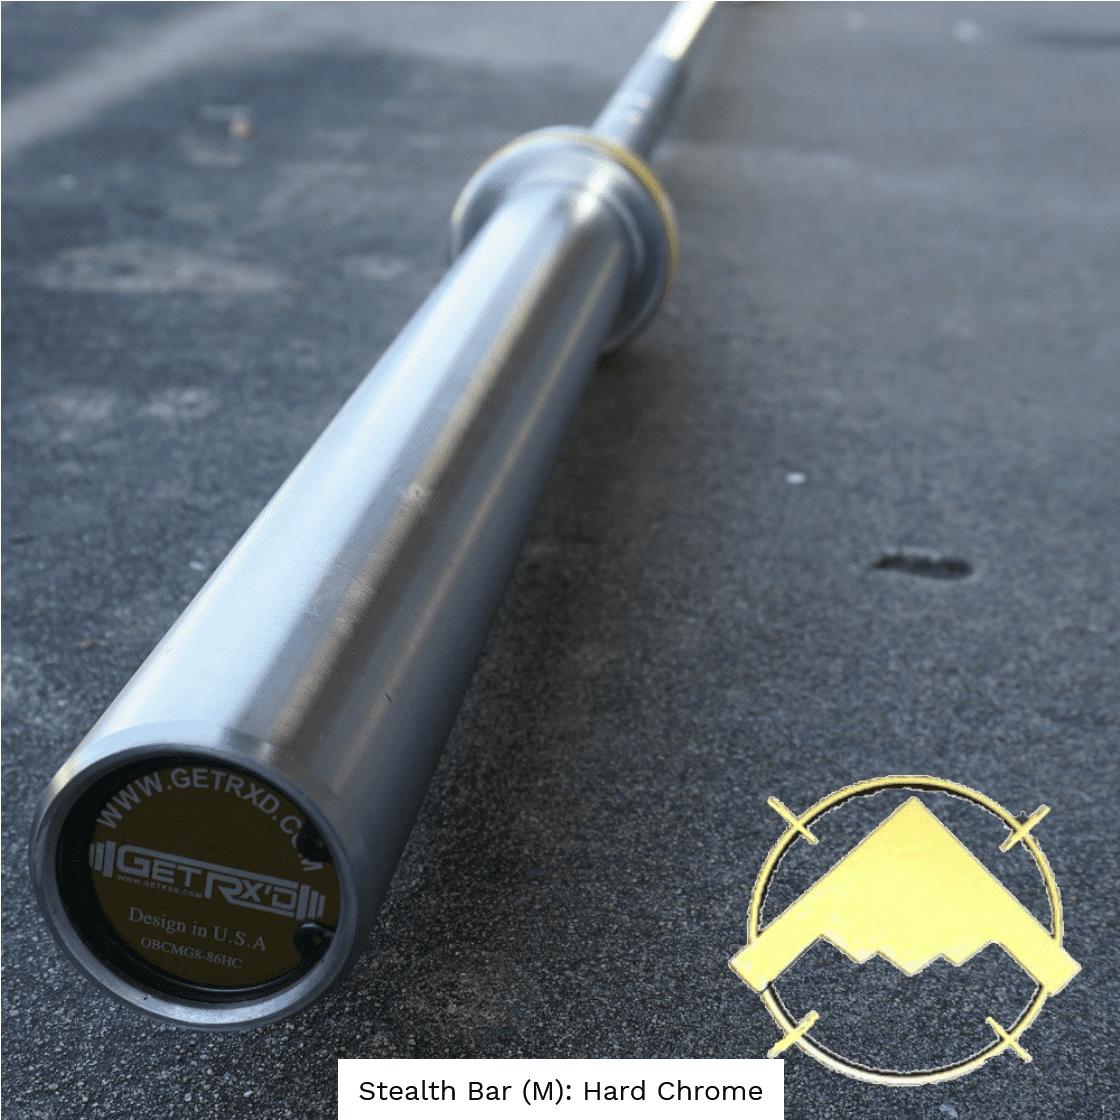 Stealth Bar: Hard Chrome